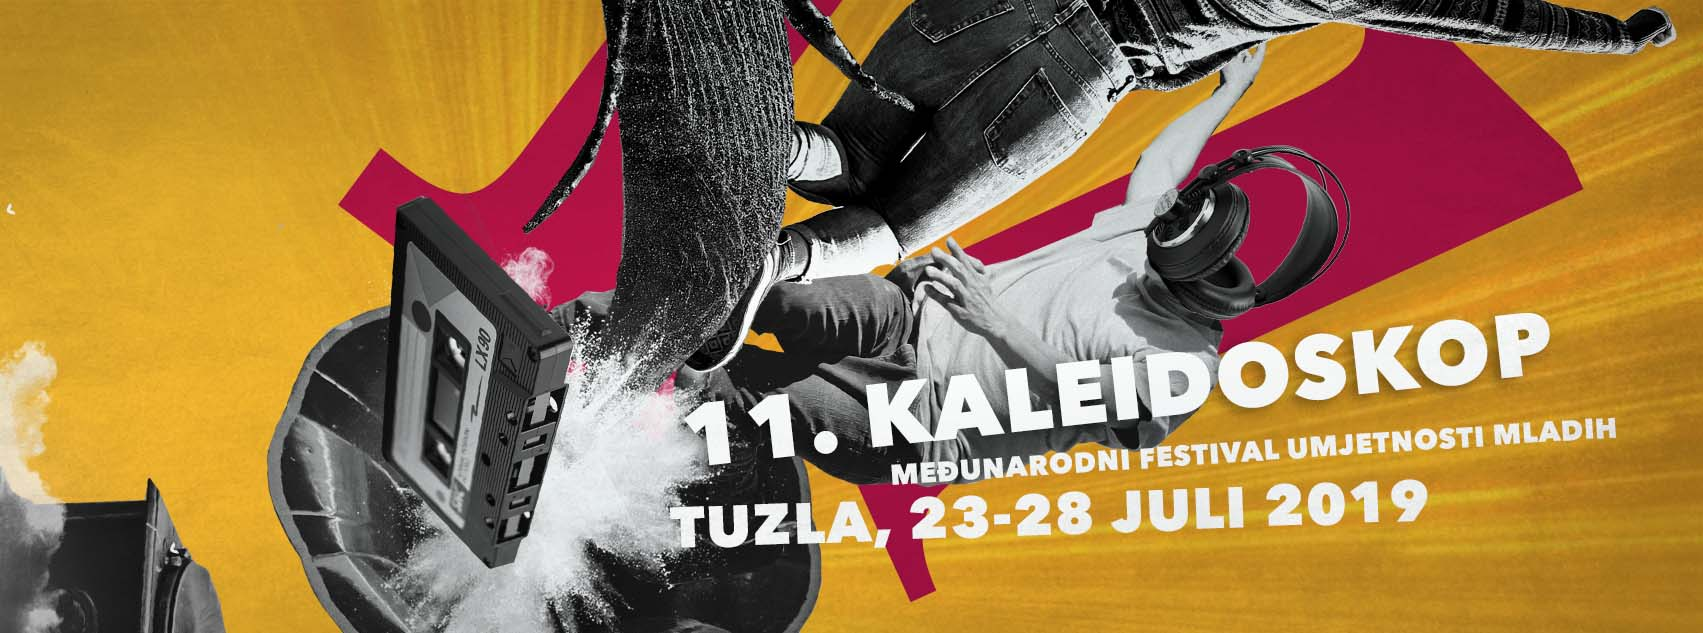 Kaleidoskop u Tuzlu dovodi Hladno pivo, Elemental, Bombaj štampu…